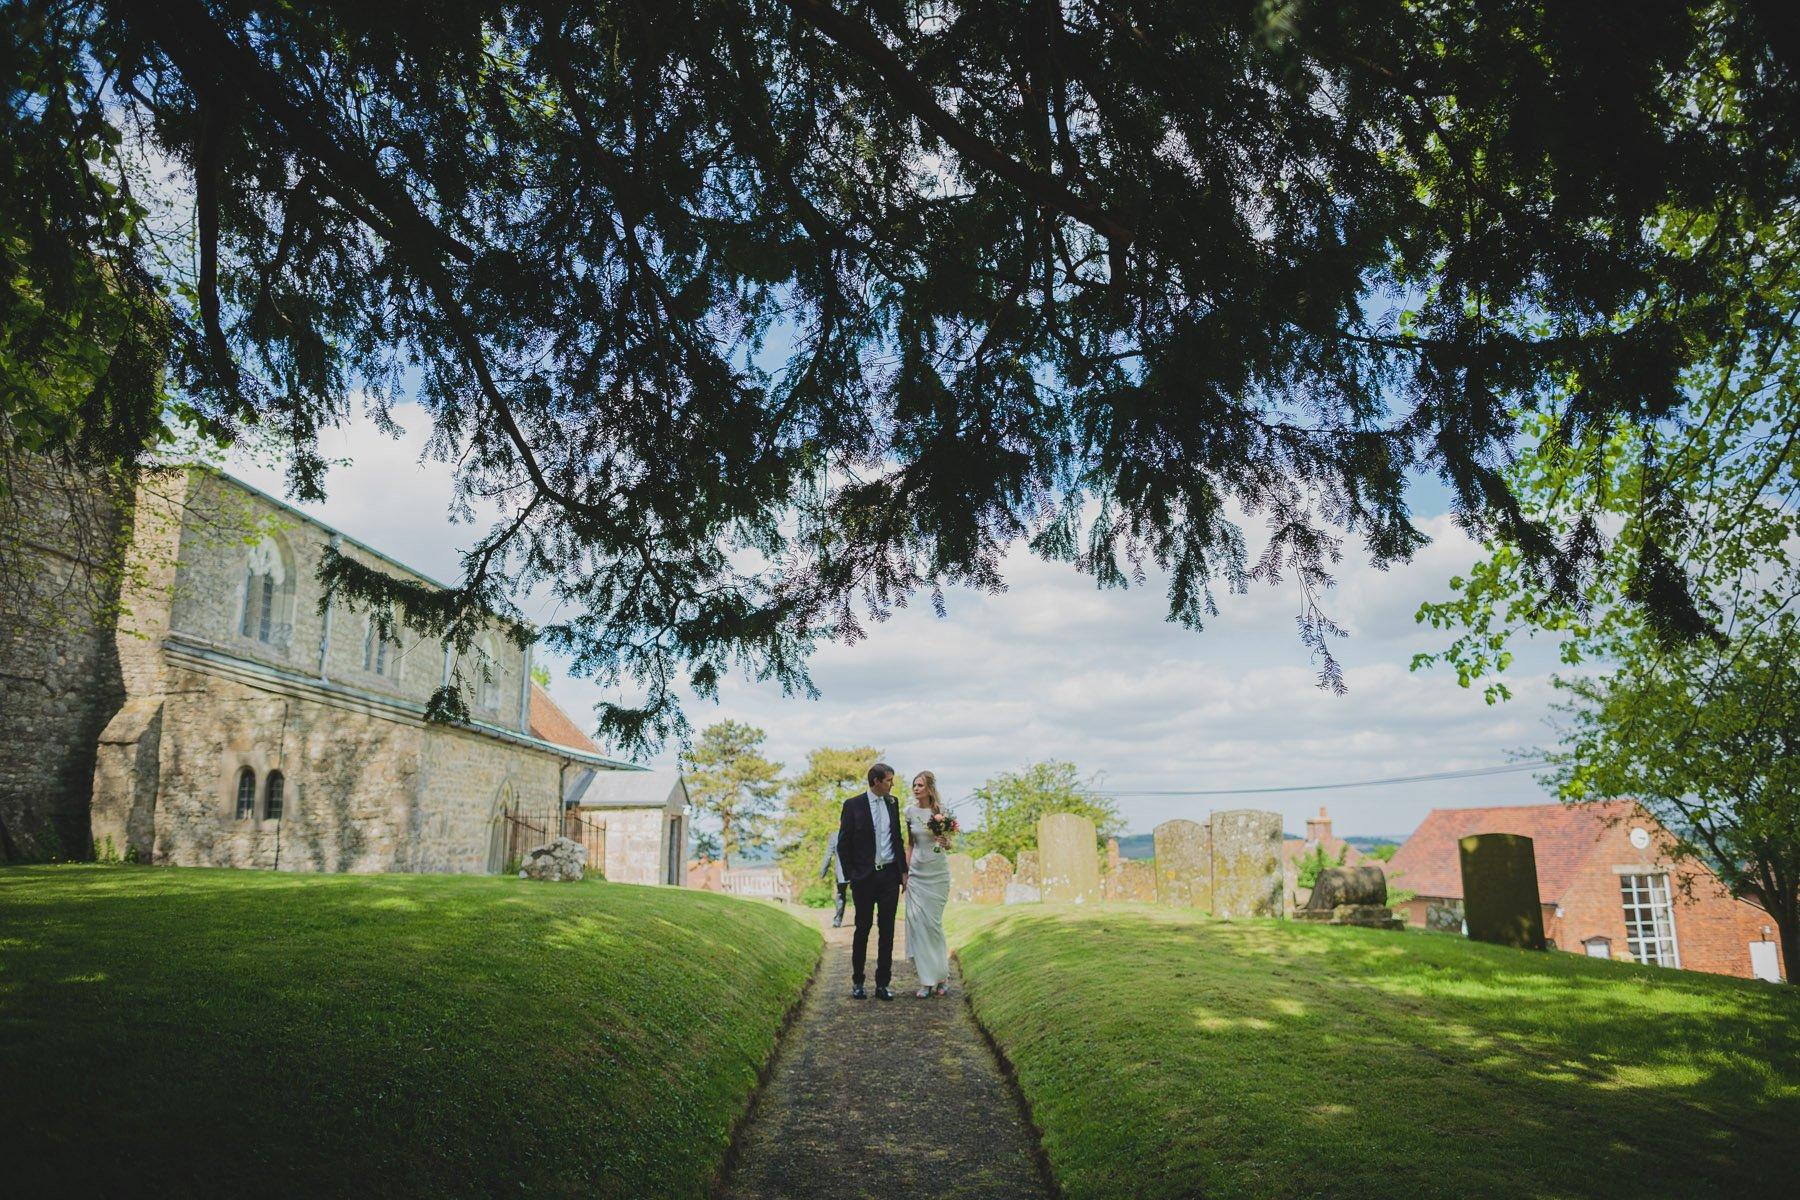 Buckinghamshire-Wedding-Lizzie-Duncan-081